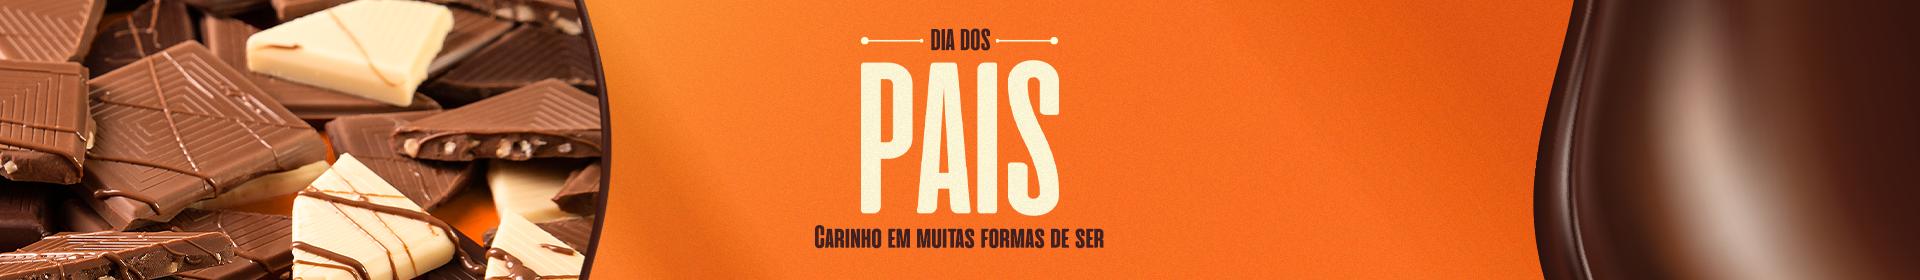 Banner de Categoria